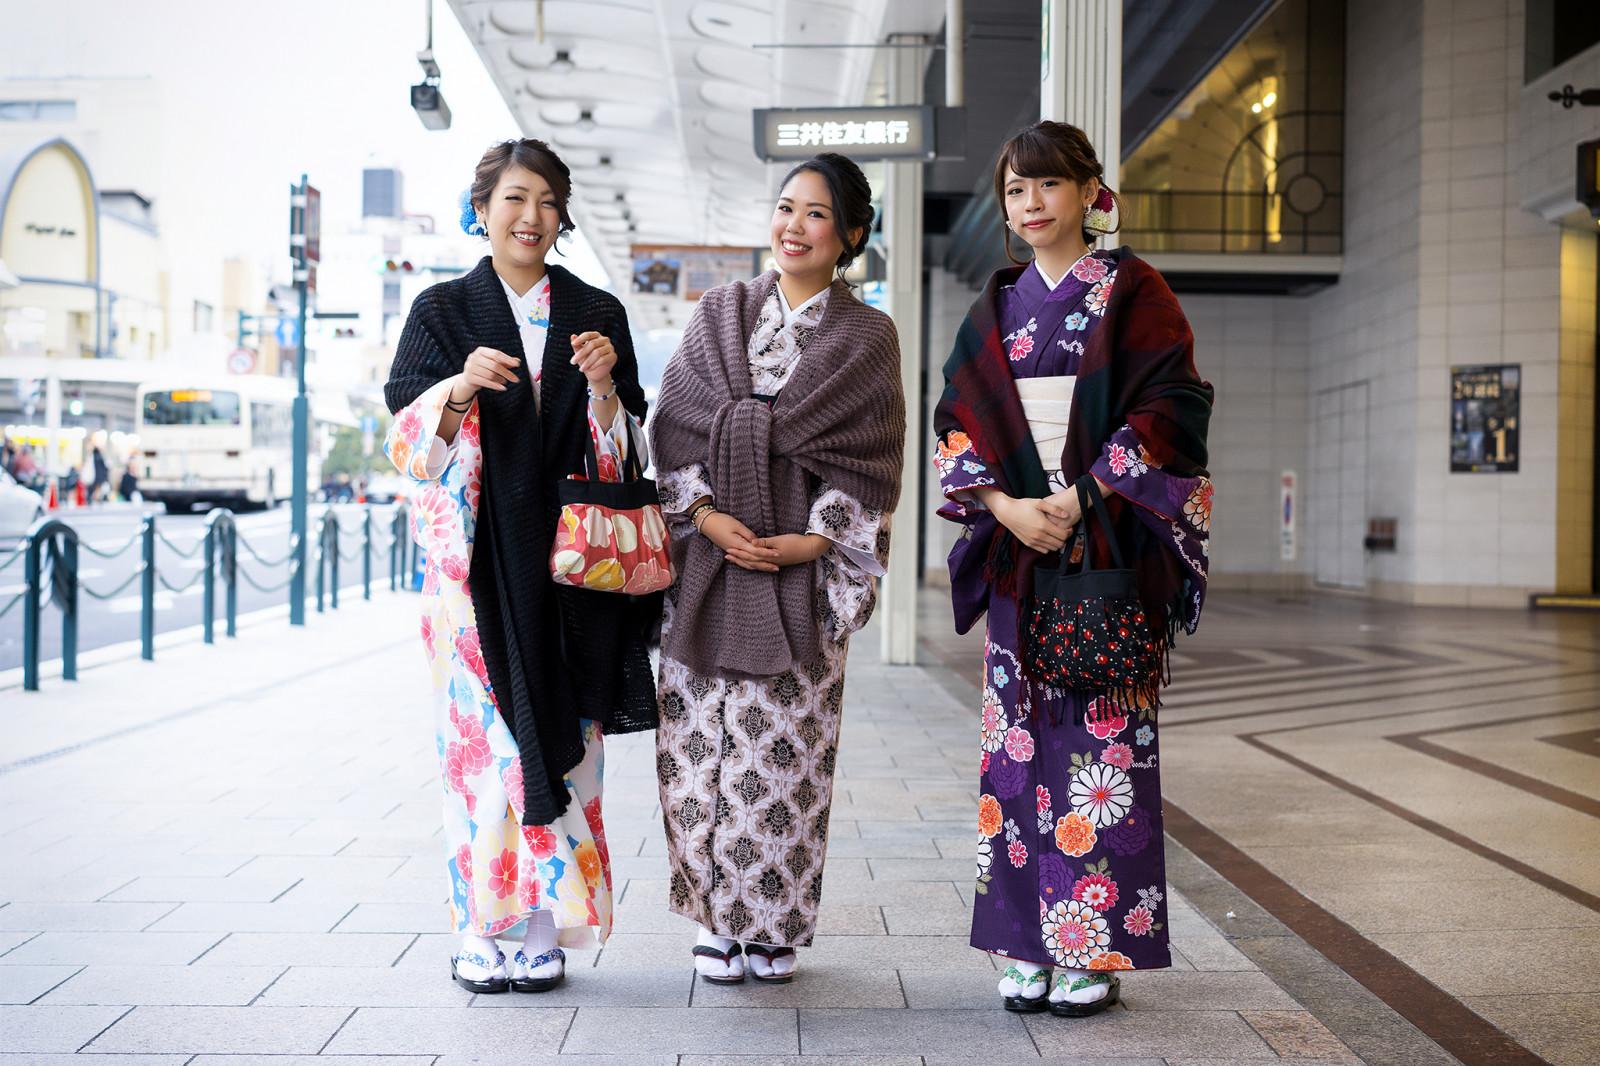 black-candid-japanese-girl-photos-nudes-prosthetics